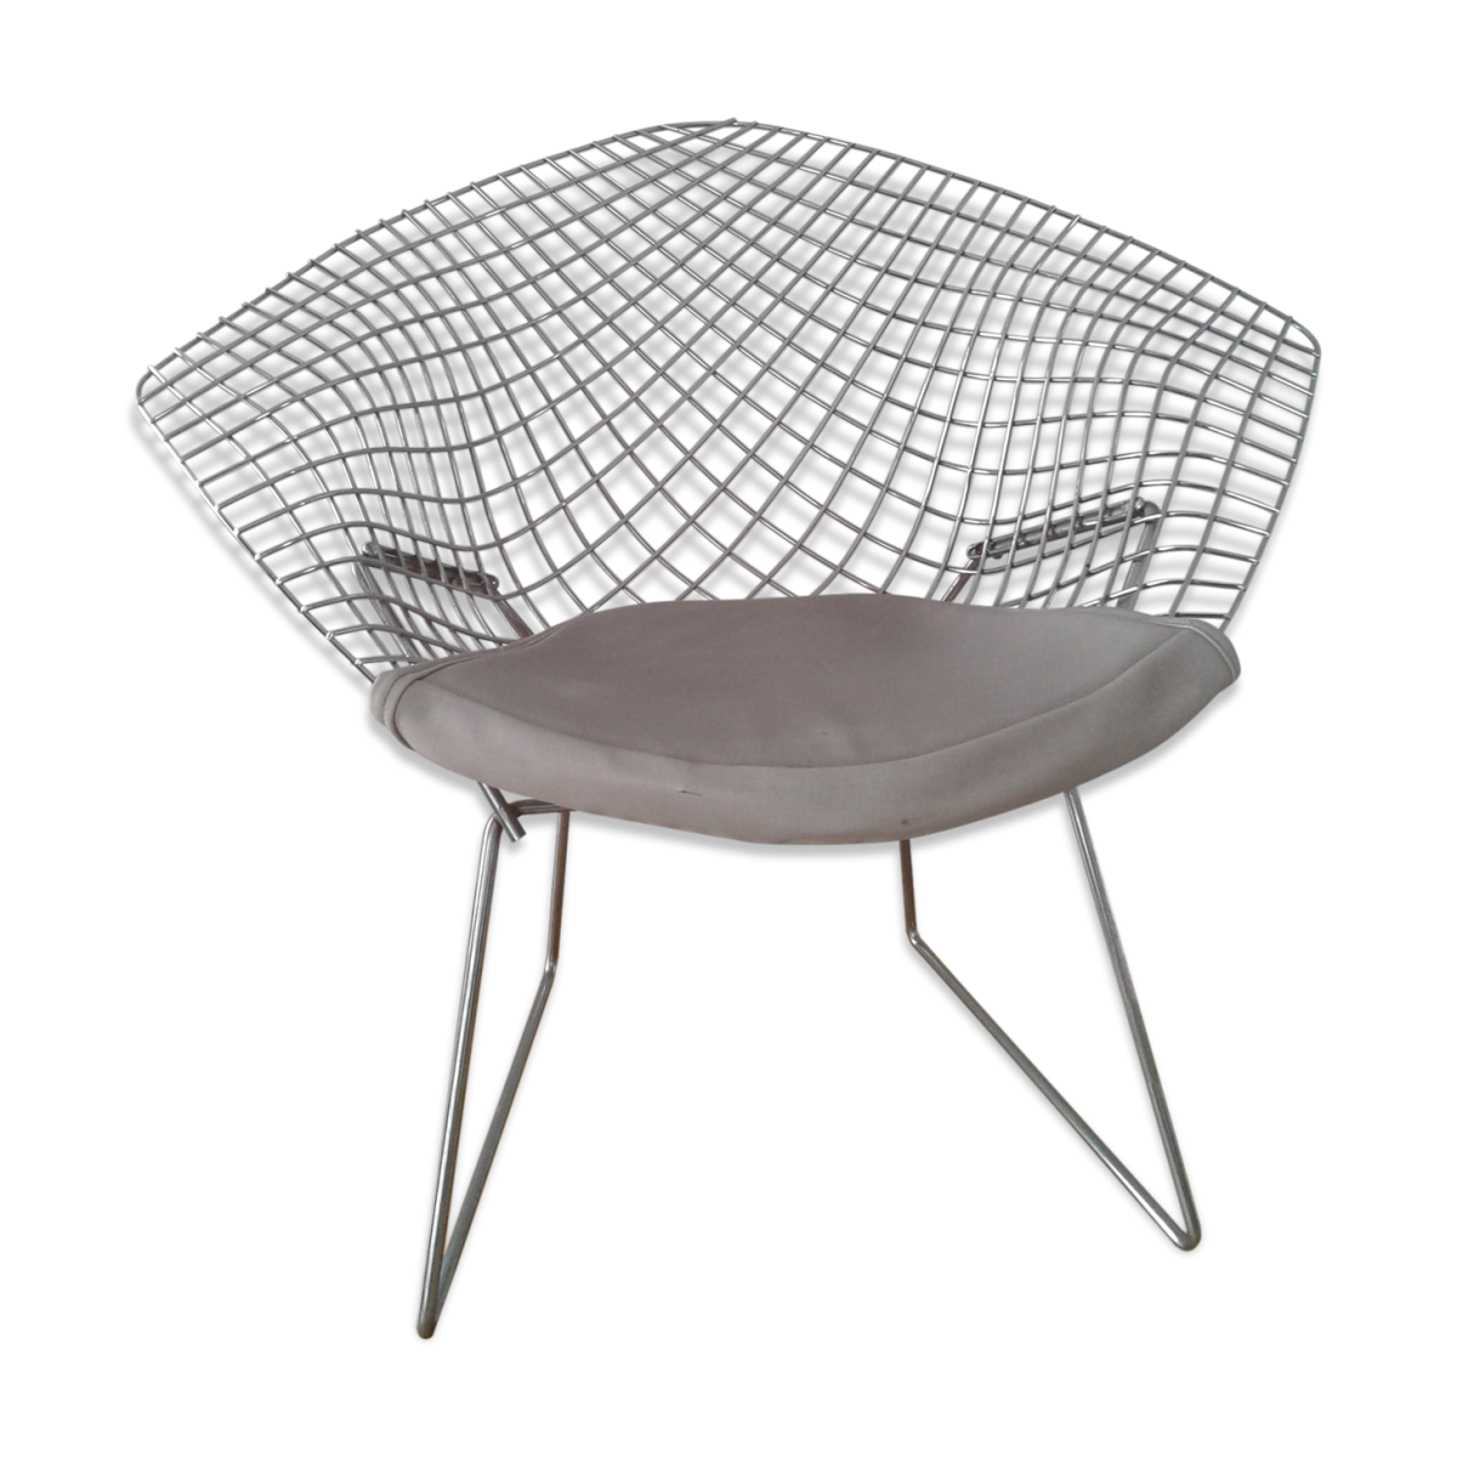 Fauteuil Diamond métal chromé design Harry Bertoia édition Knoll années 70